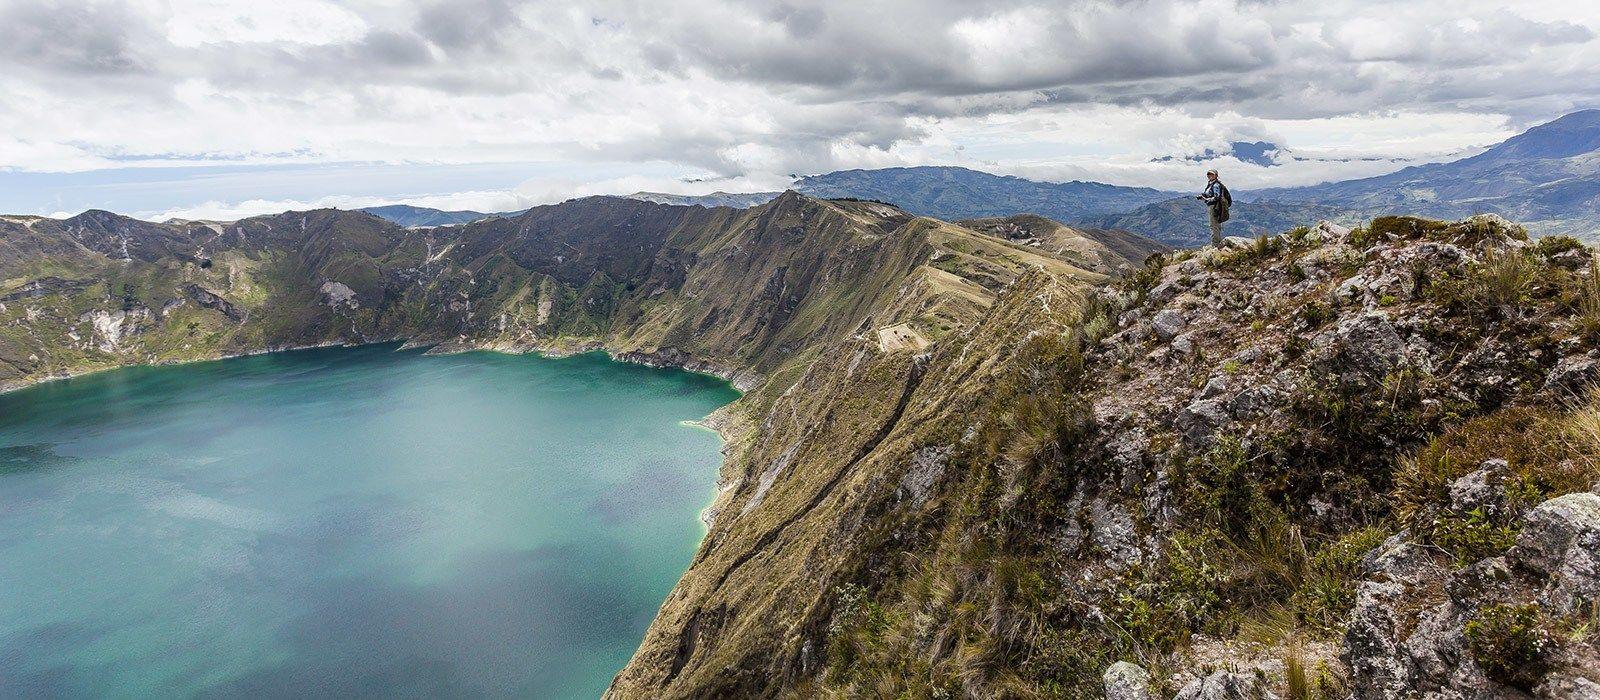 Reiseziel Quito Ecuador/Galapagos